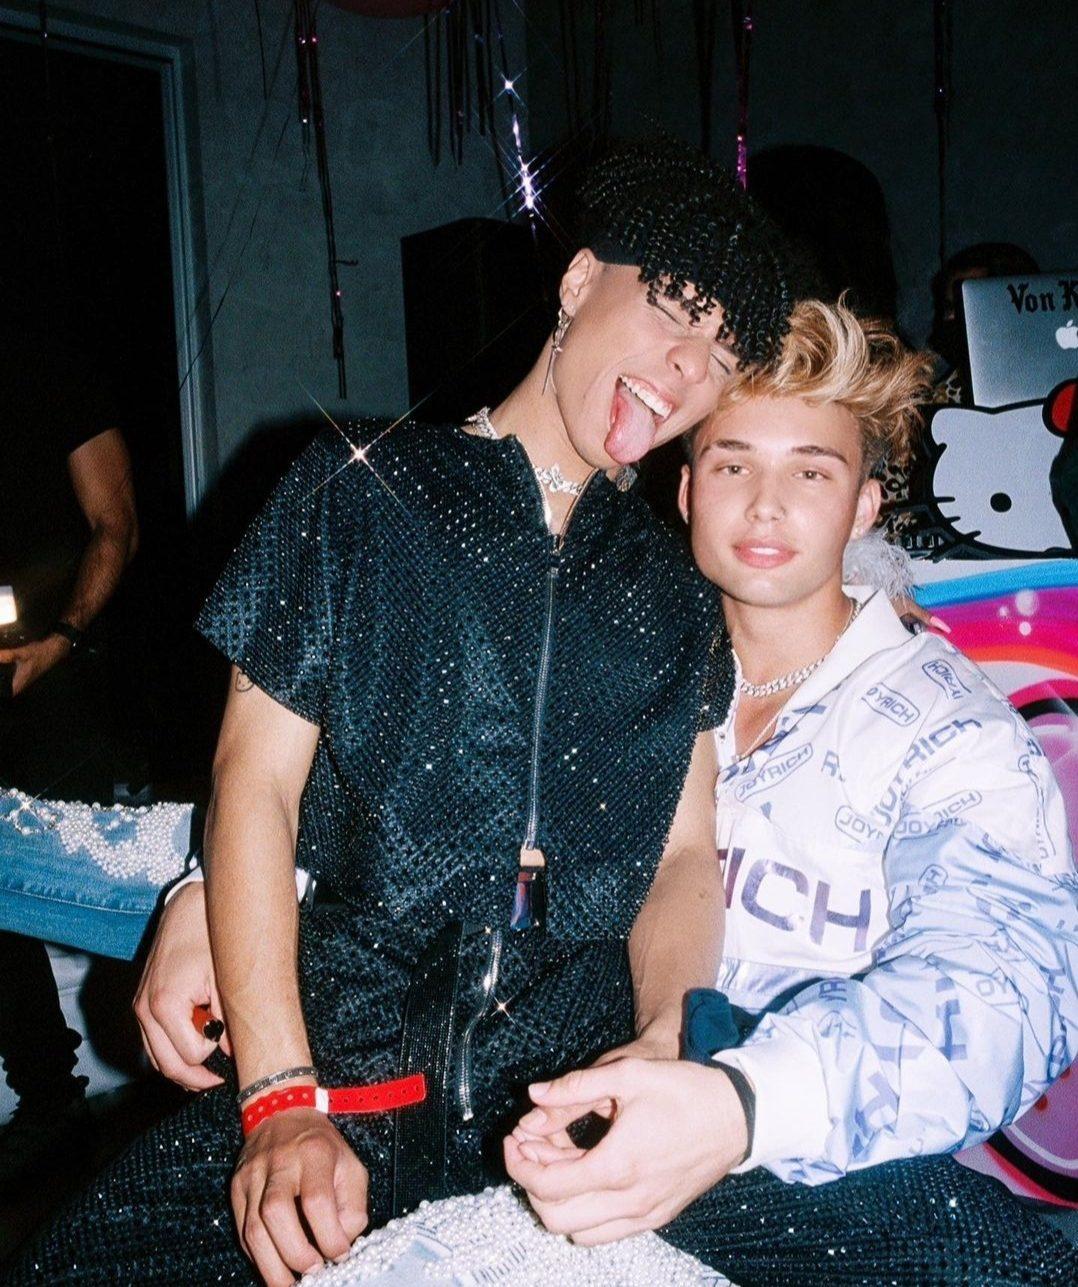 Larray with his boyfriend